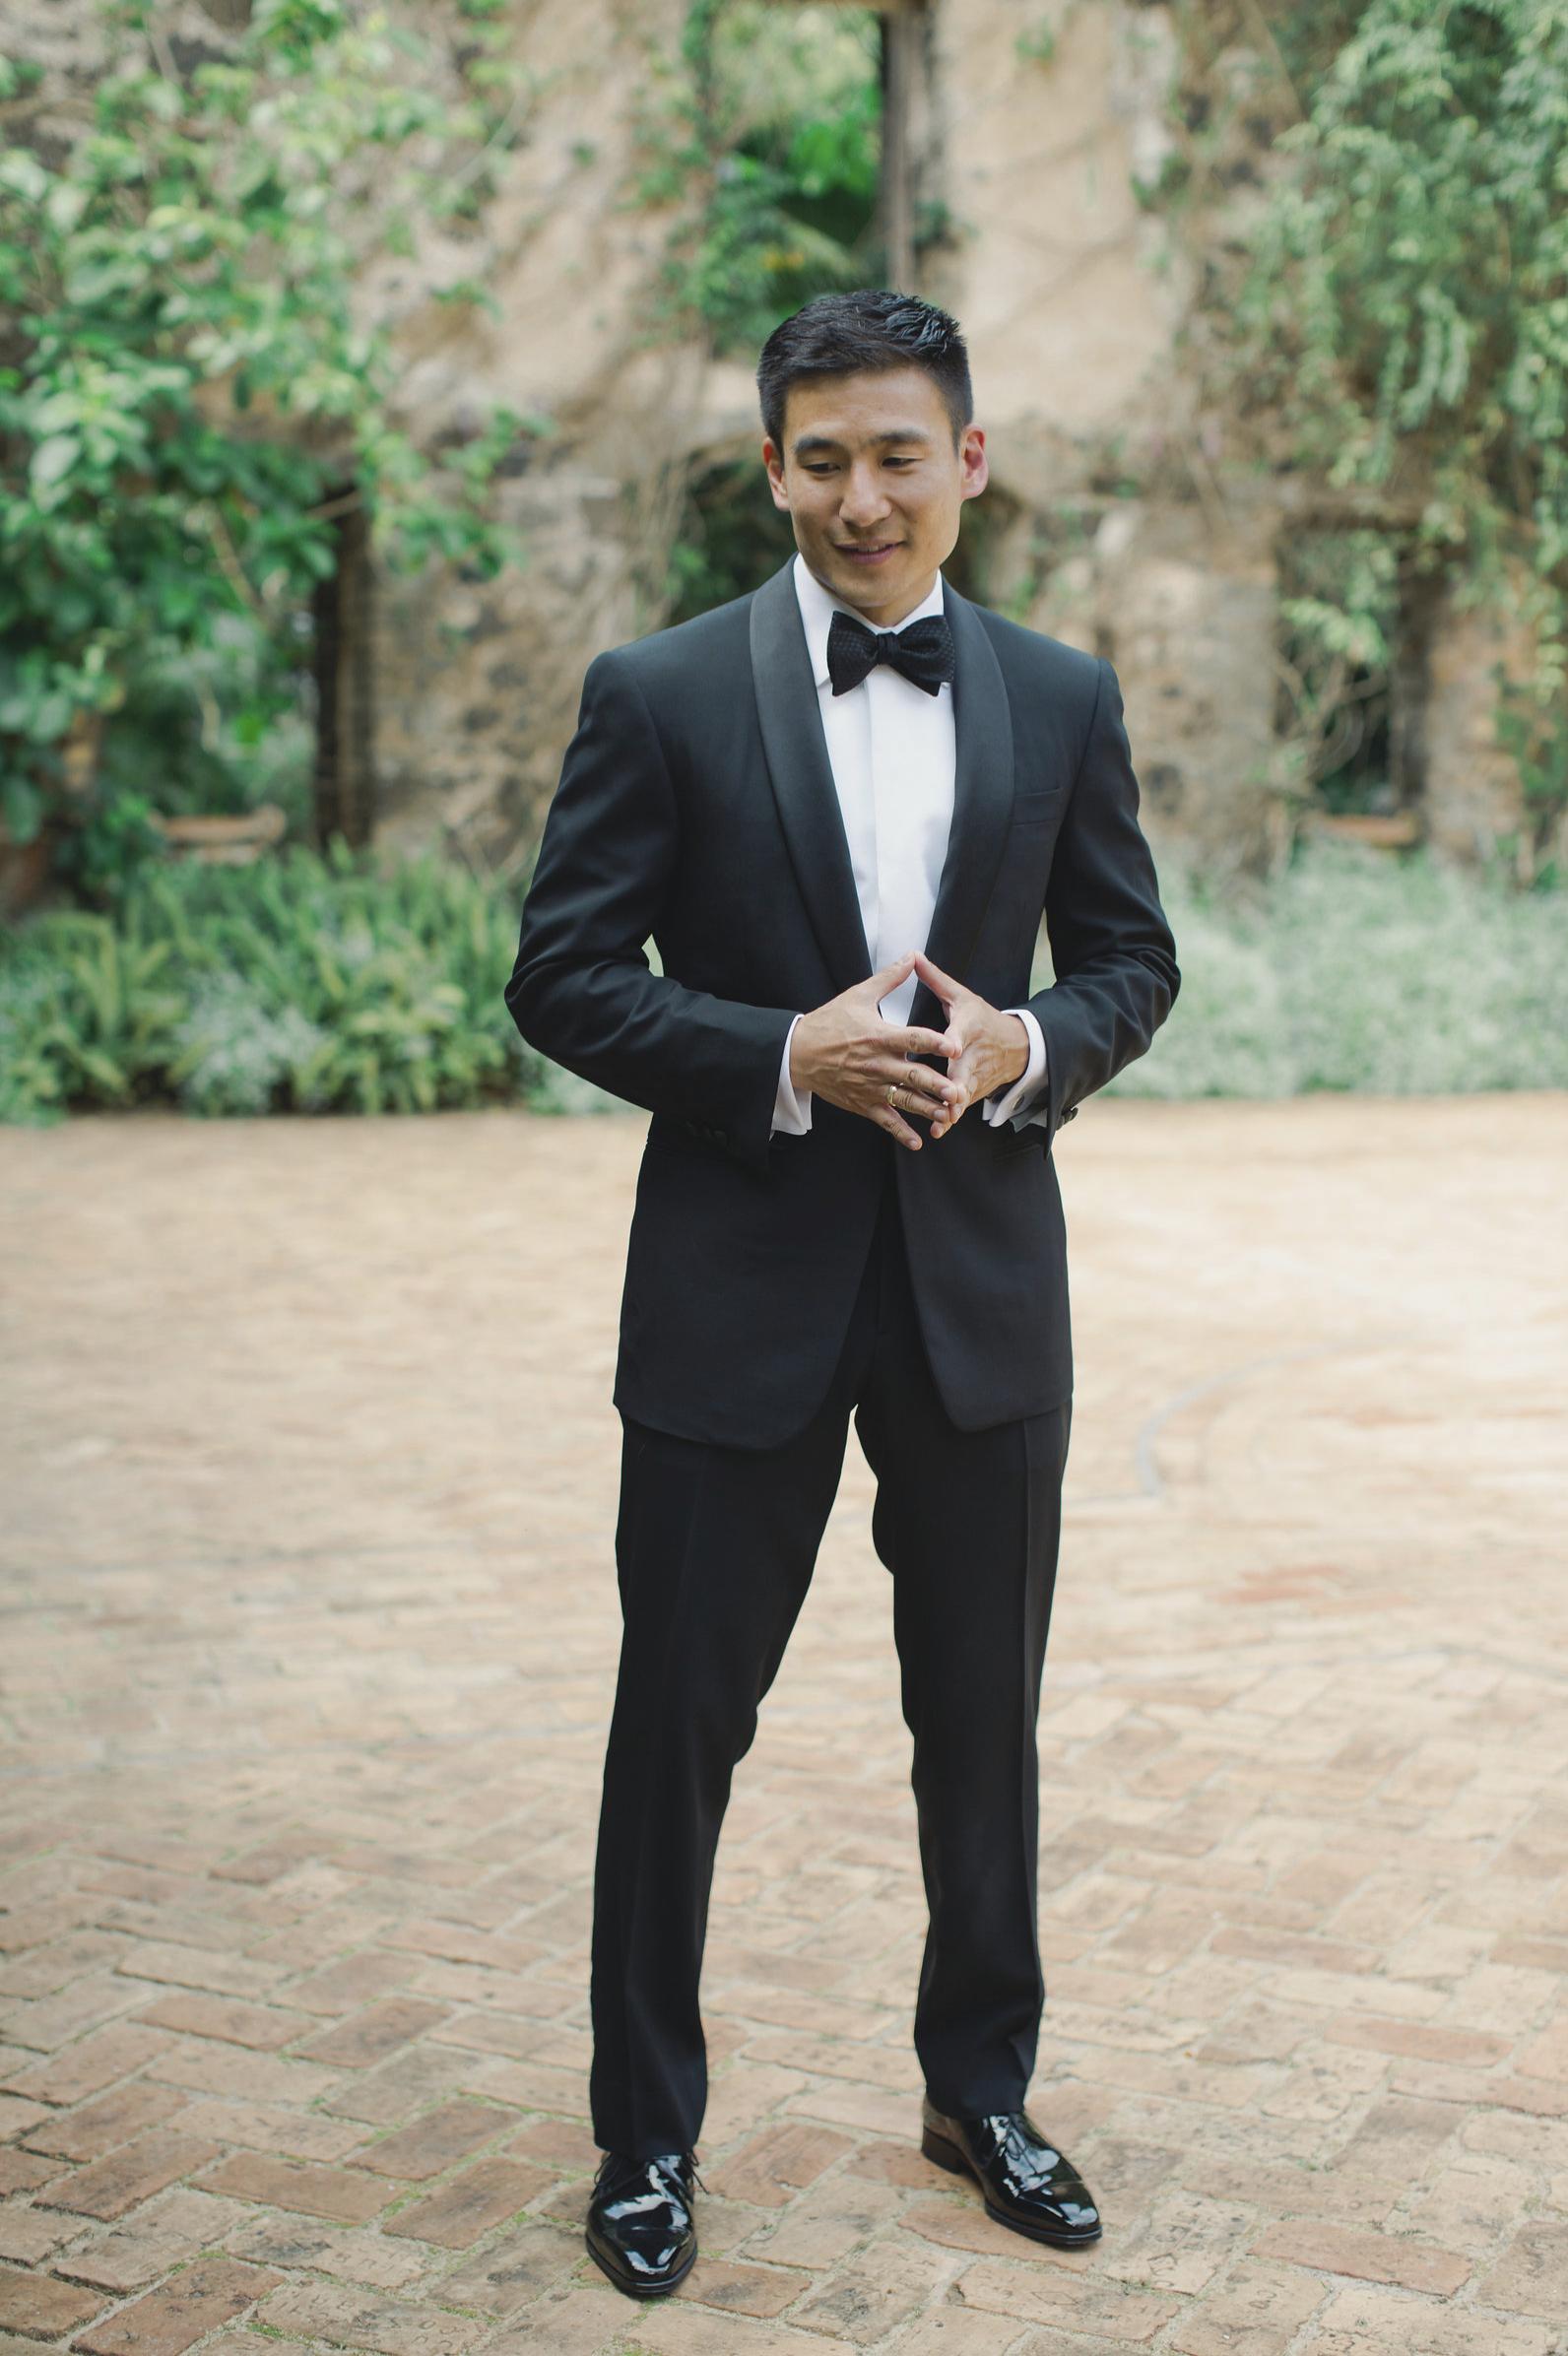 maui-wedding-photographer-chris-j-evans-grooms00003.png